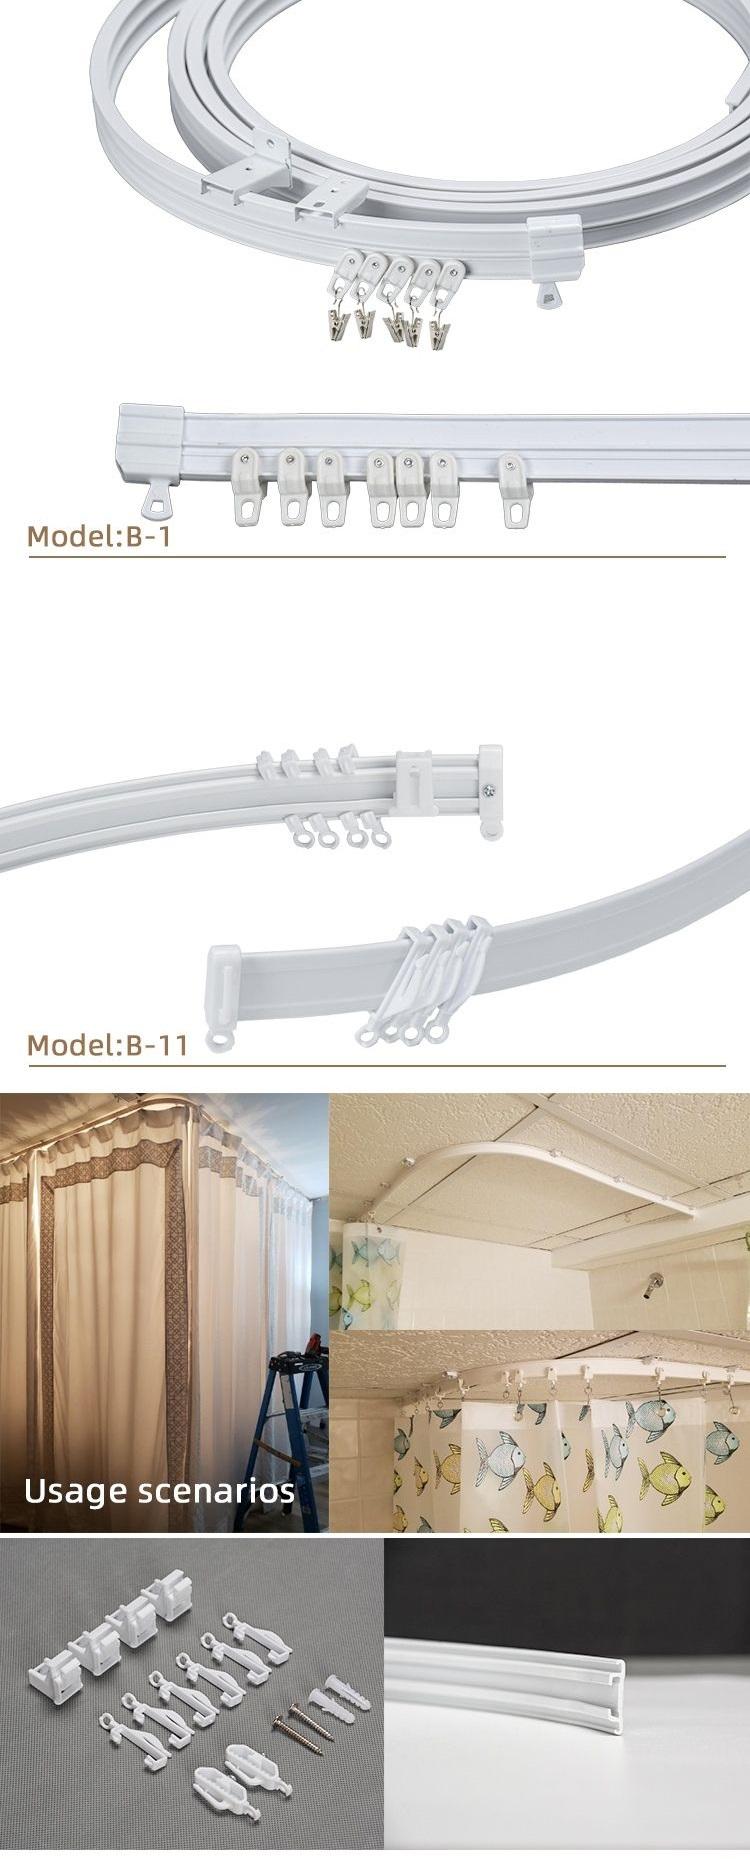 pvc round flexible ceiling curtain rail curtain track glider plastic ceiling mount curtain track amazon ebay hot seller buy amazon ebay hot seller